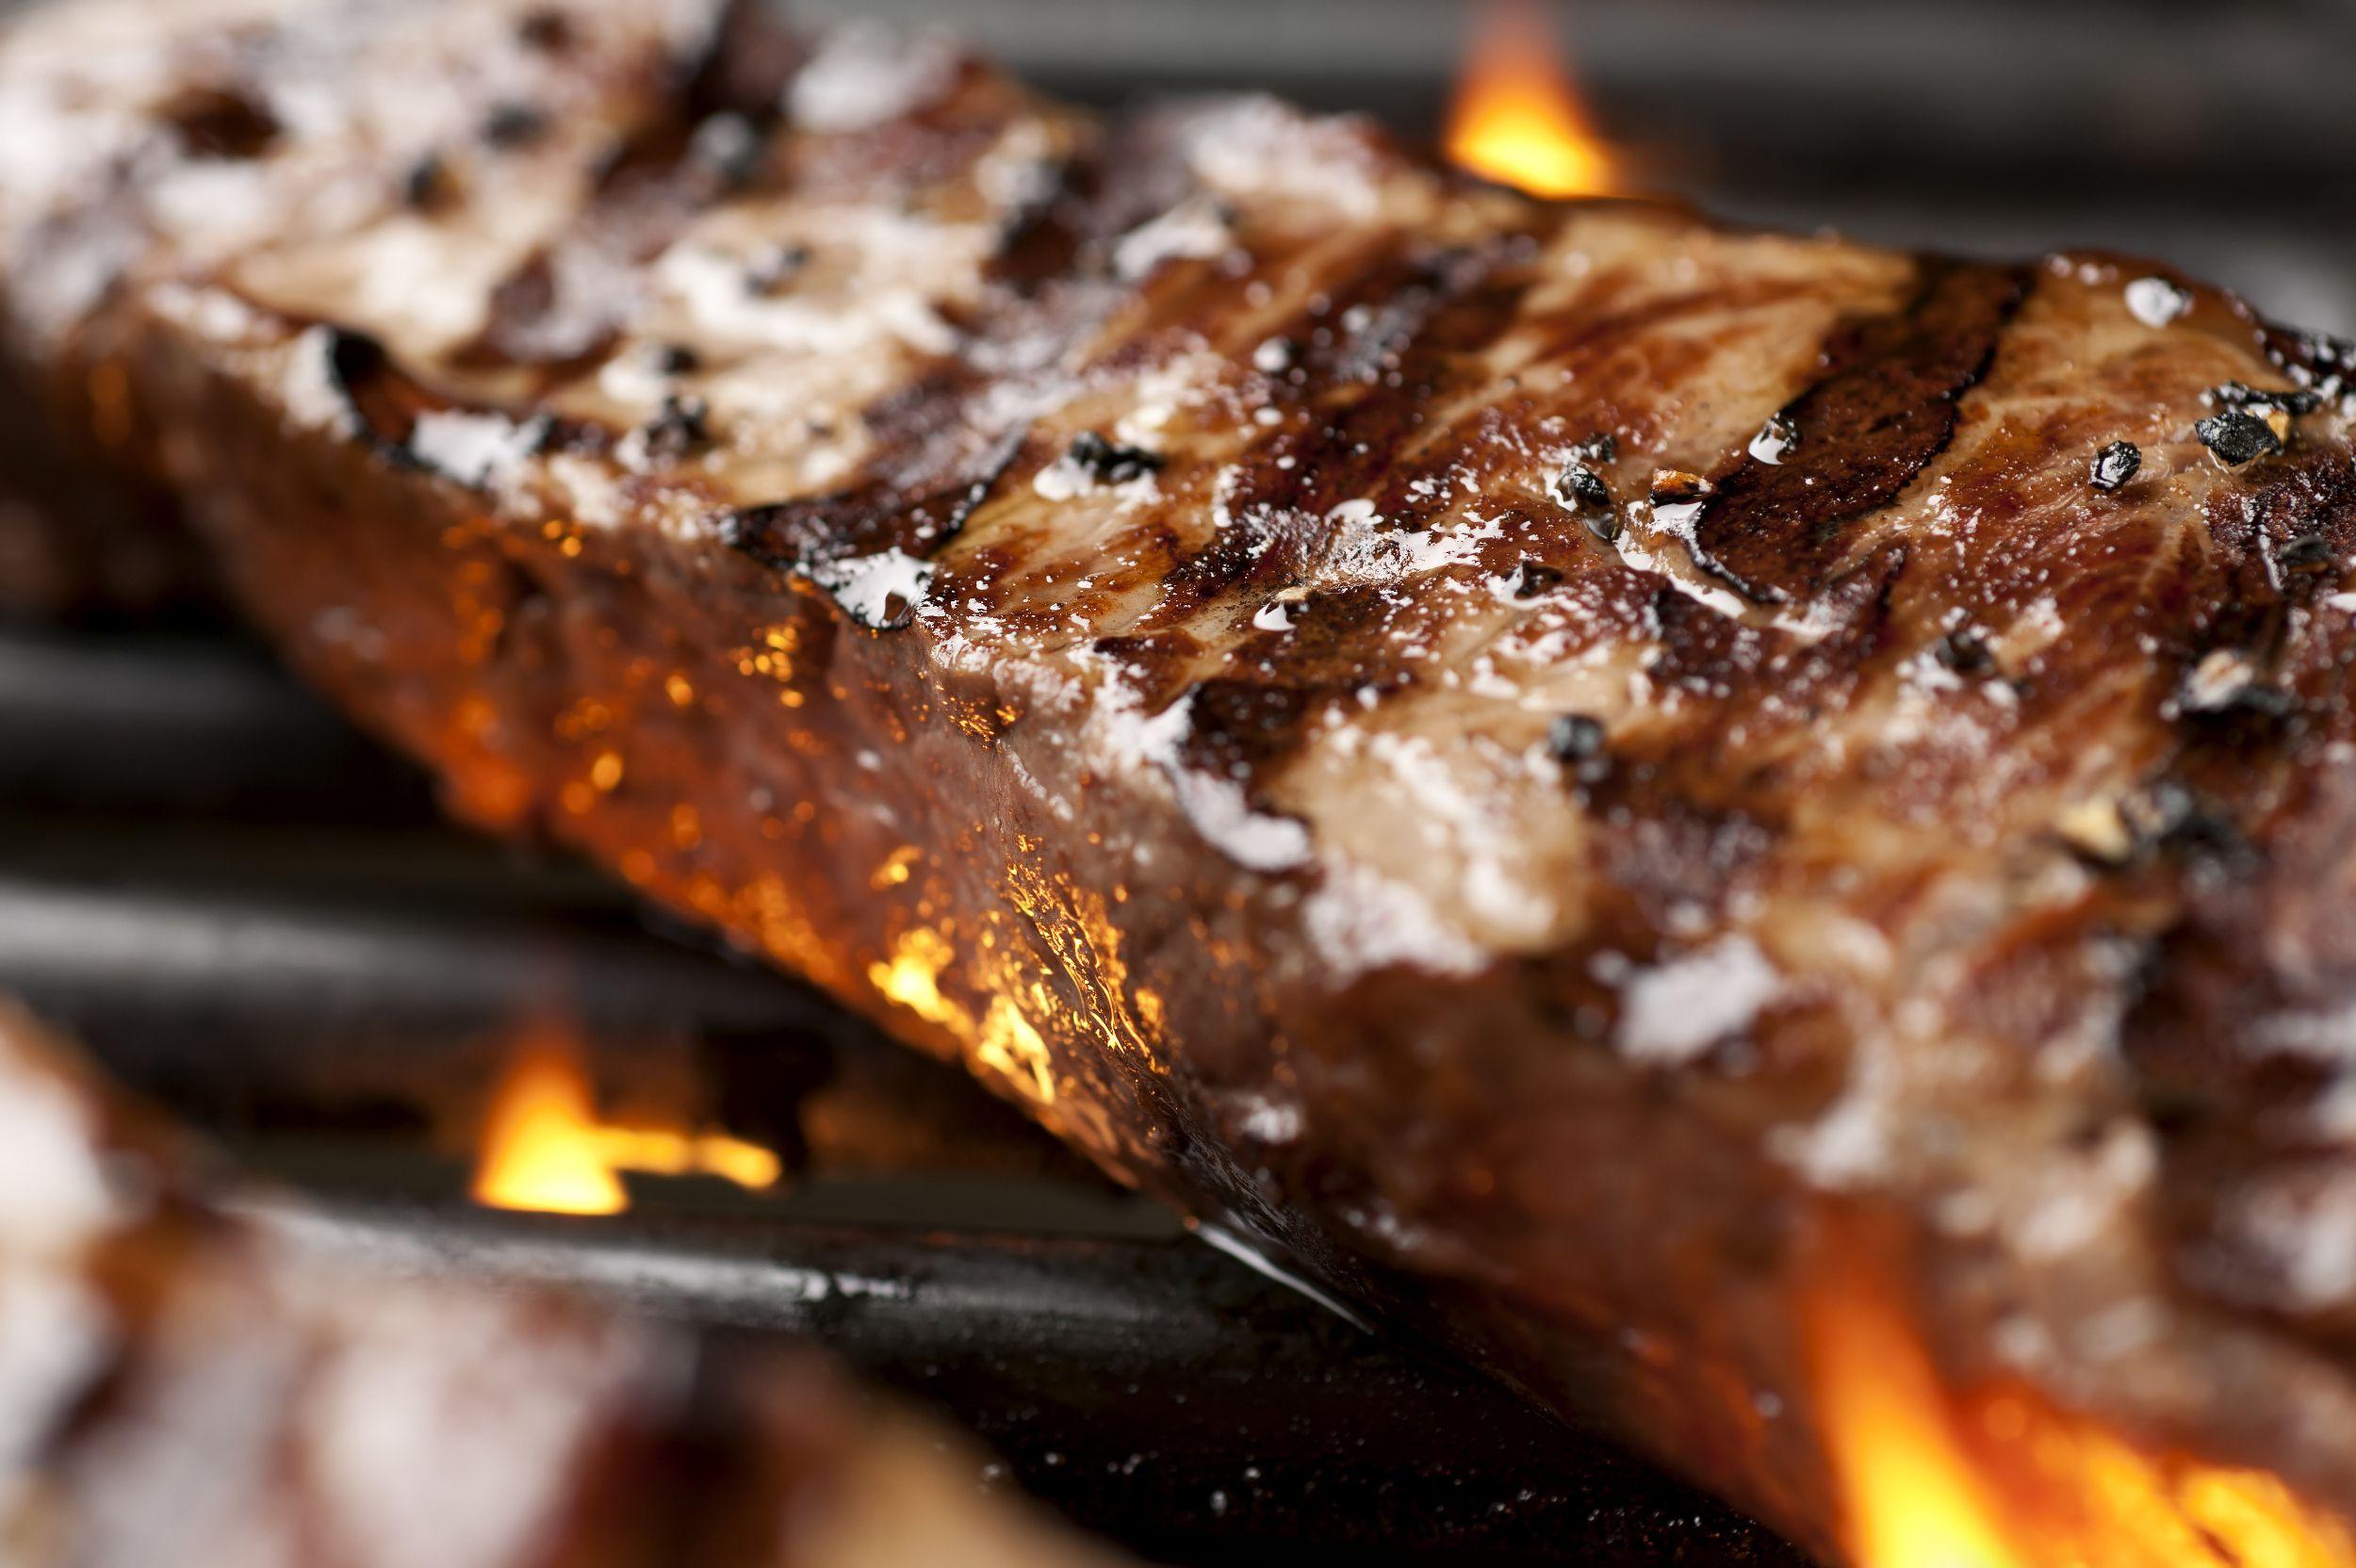 Best Way To Cook New York Strip Steaks